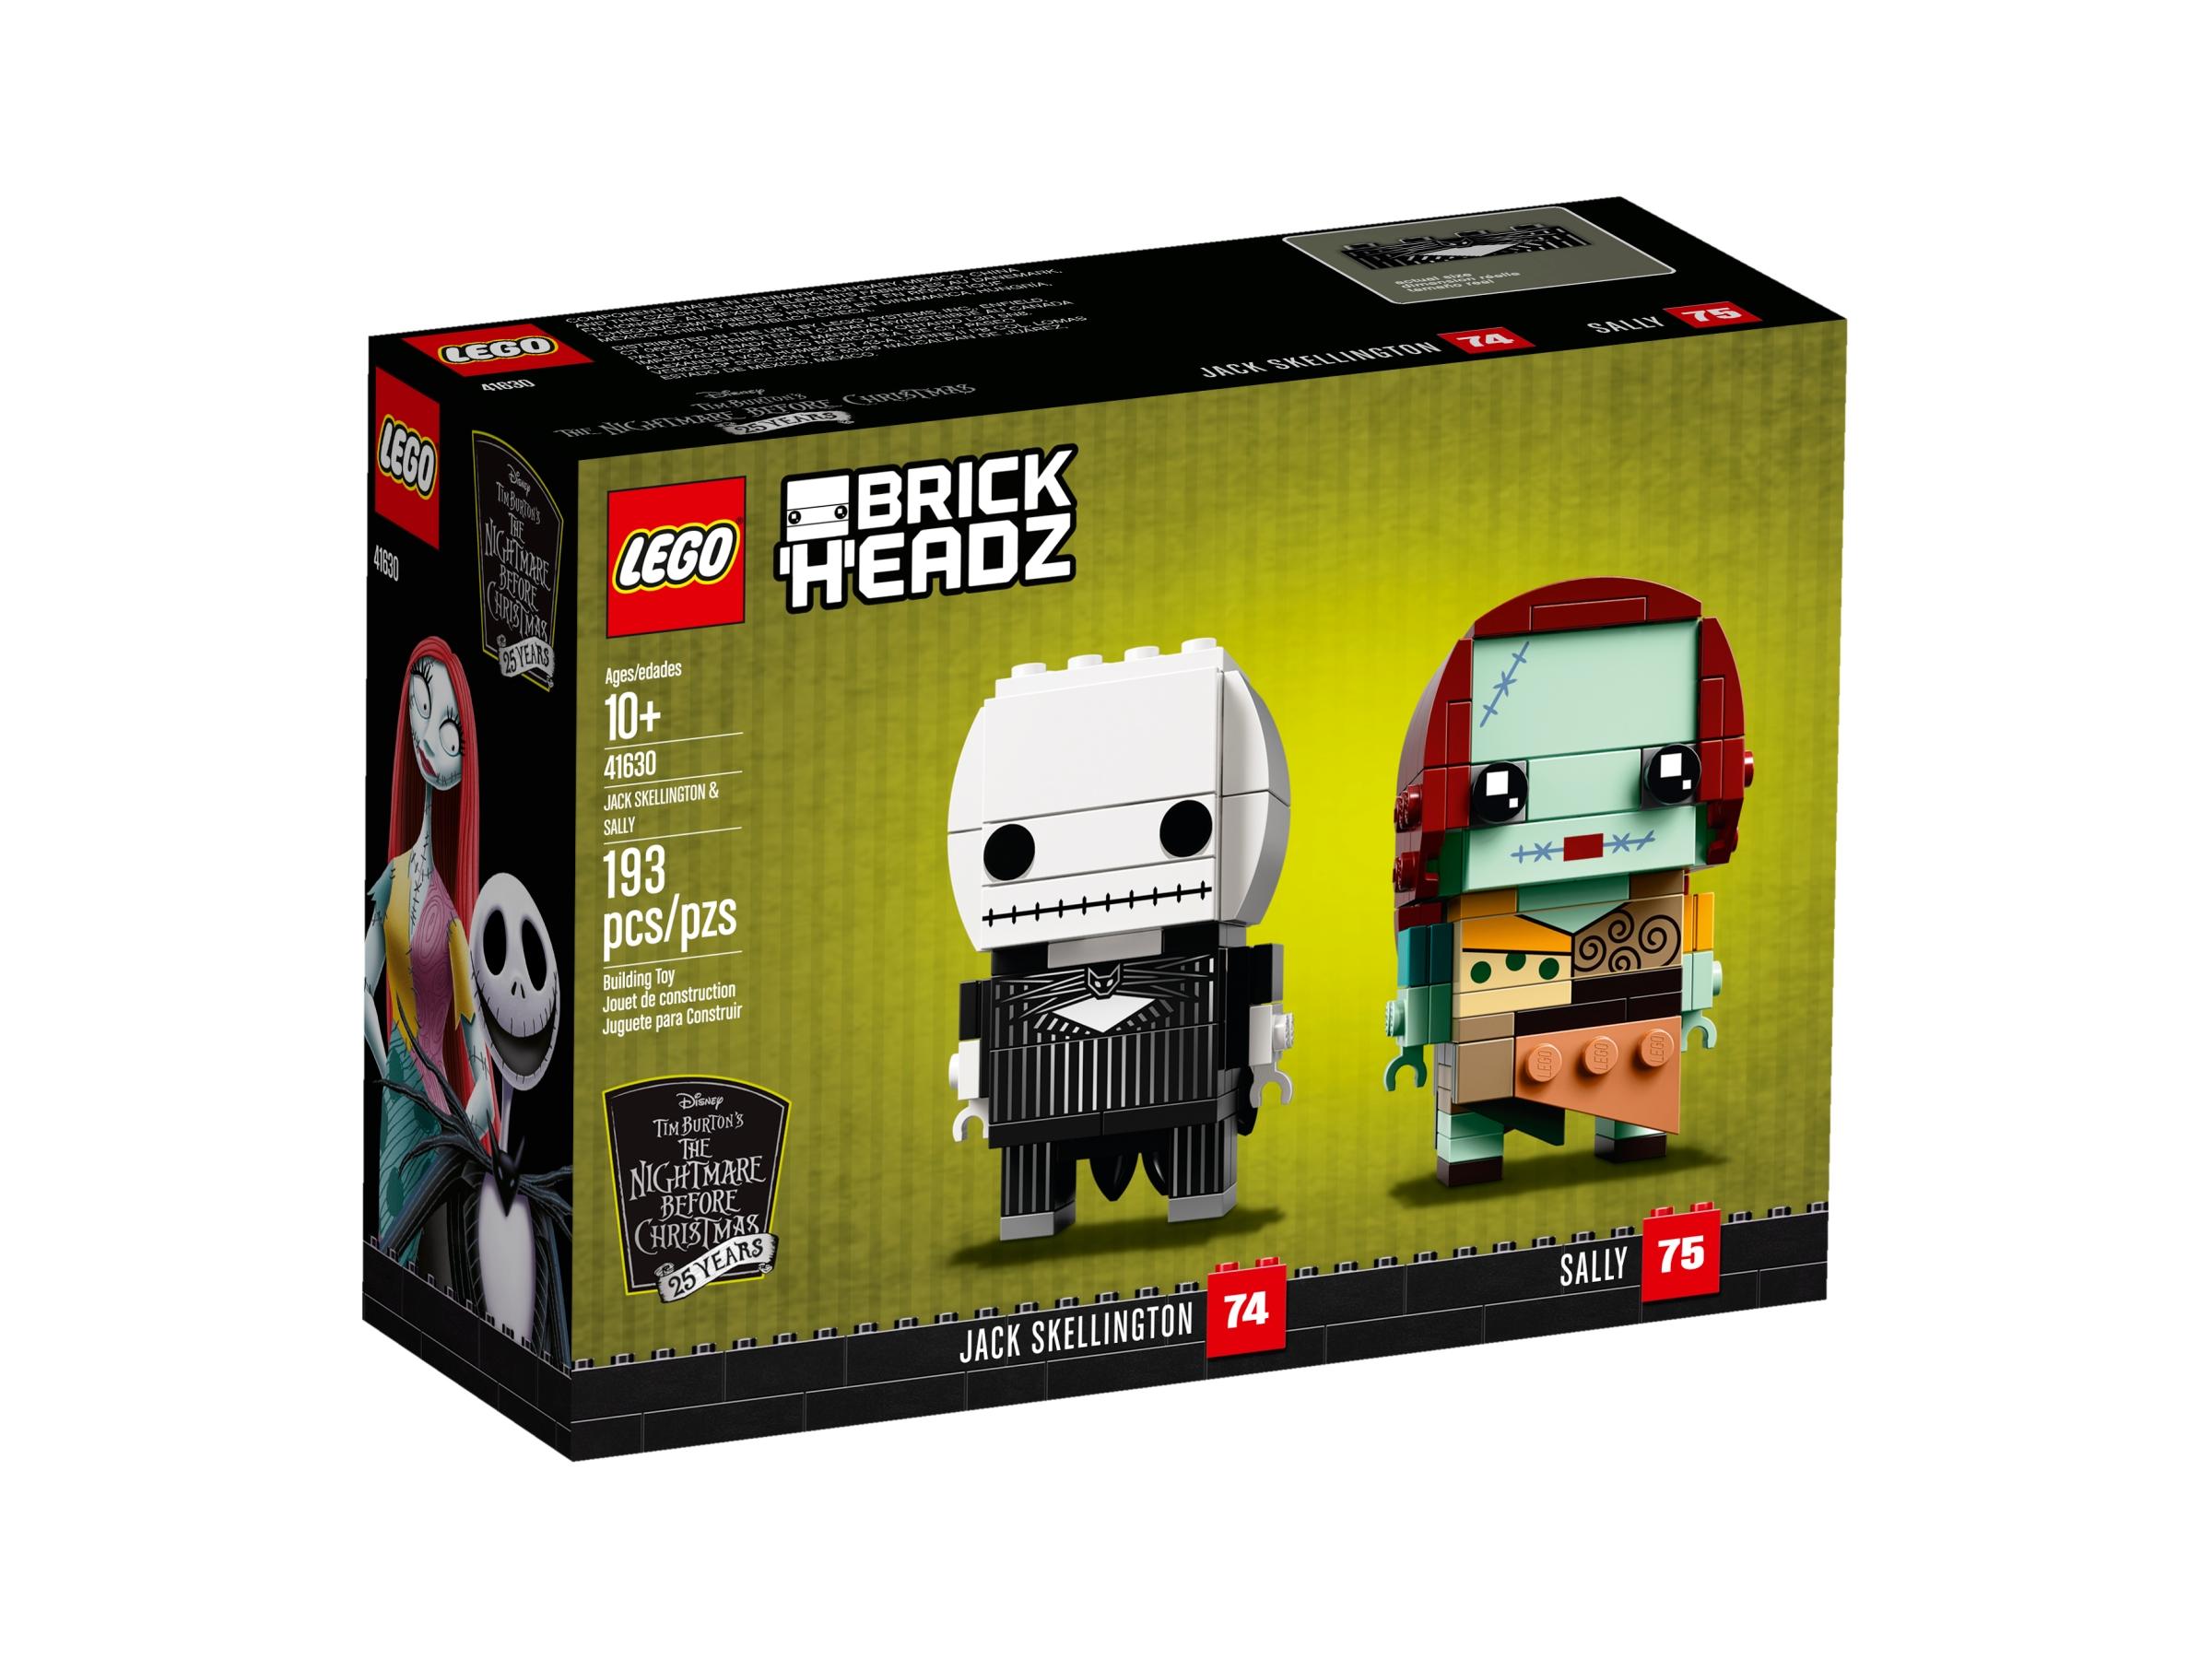 Lego Brickheadz Jack Skellington /& Sally Display Stand 41630